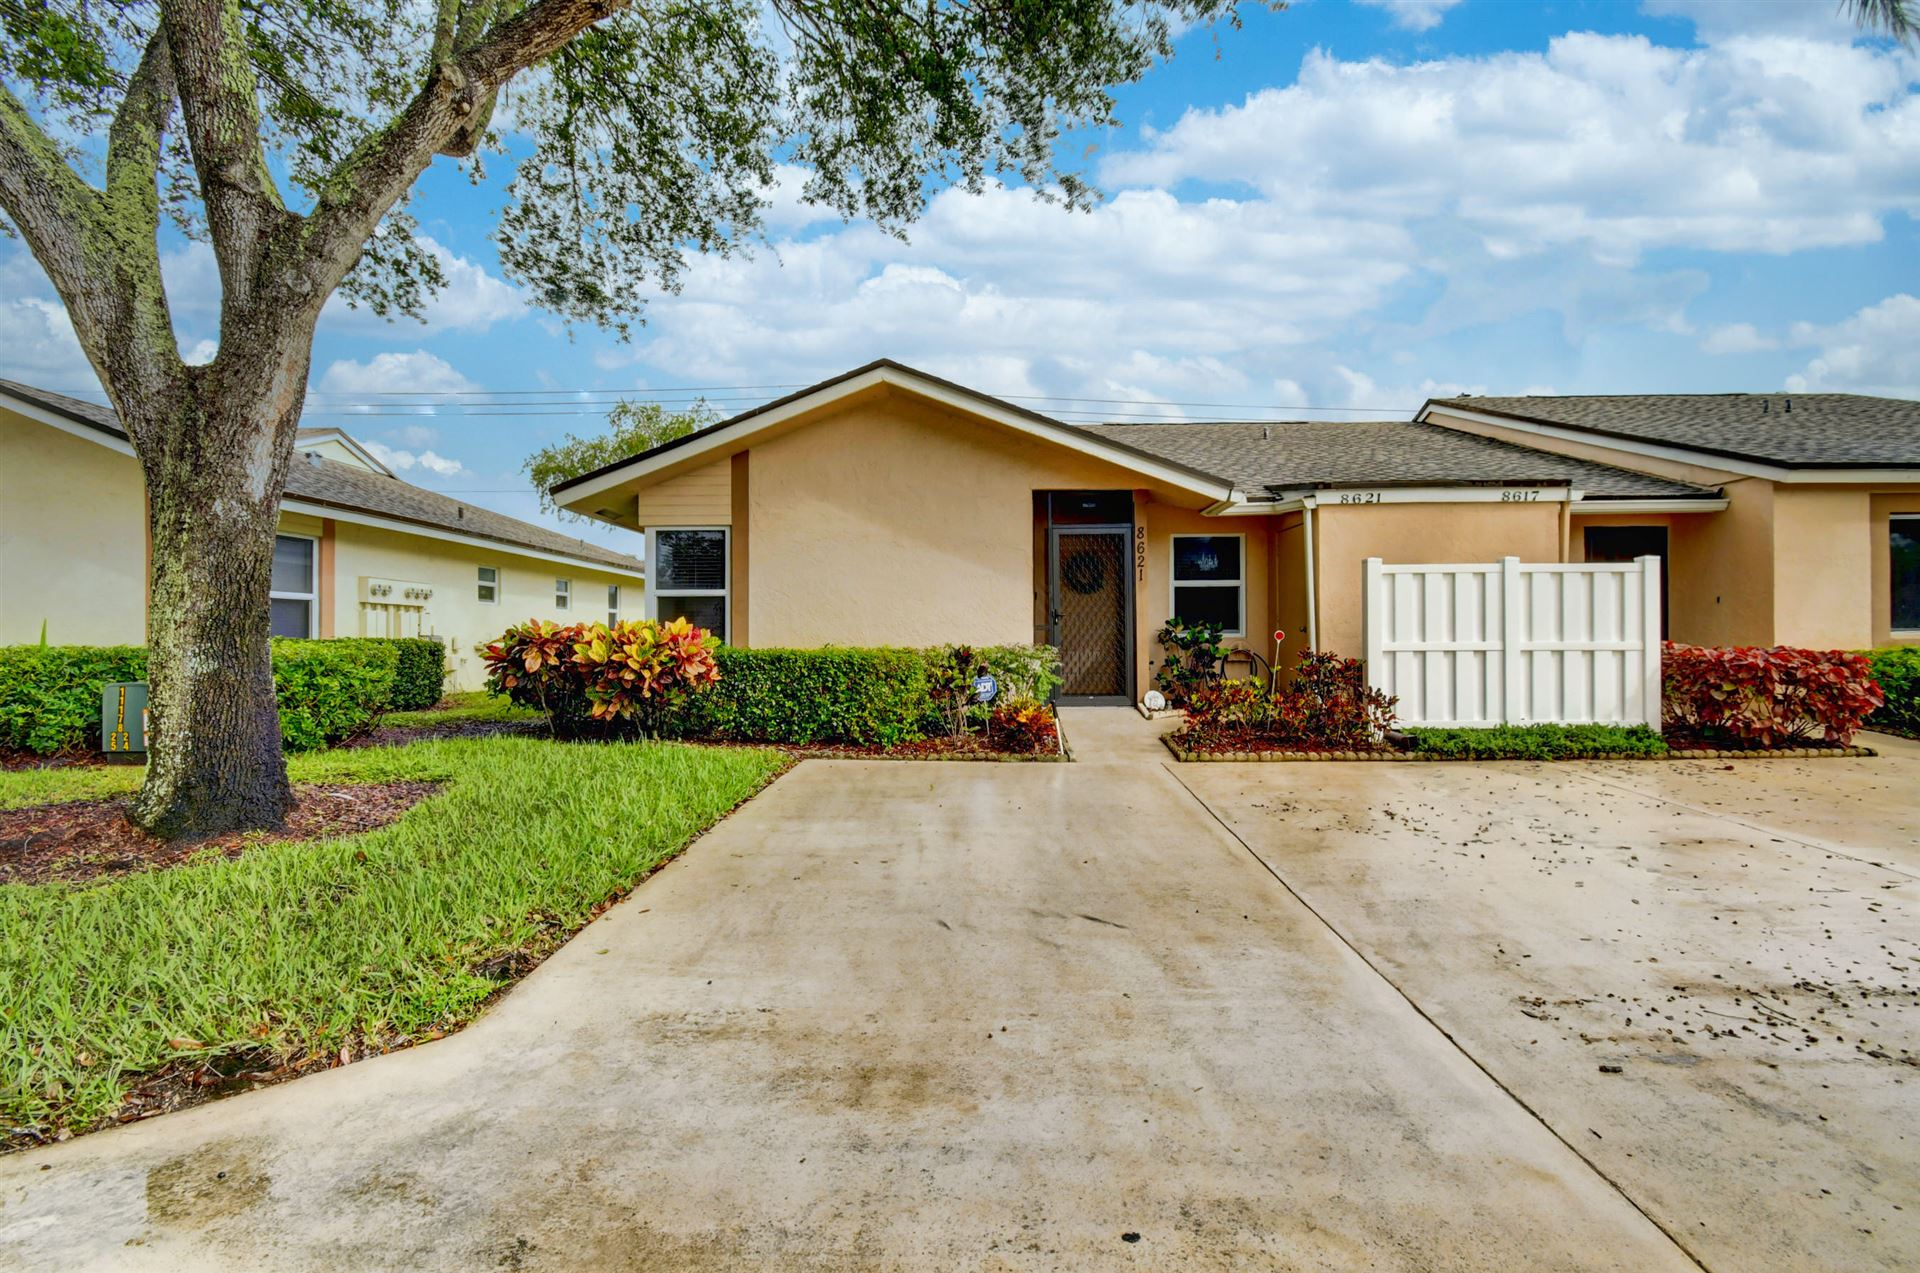 8621 Sunbird Place, Boca Raton, FL 33496 - #: RX-10661010